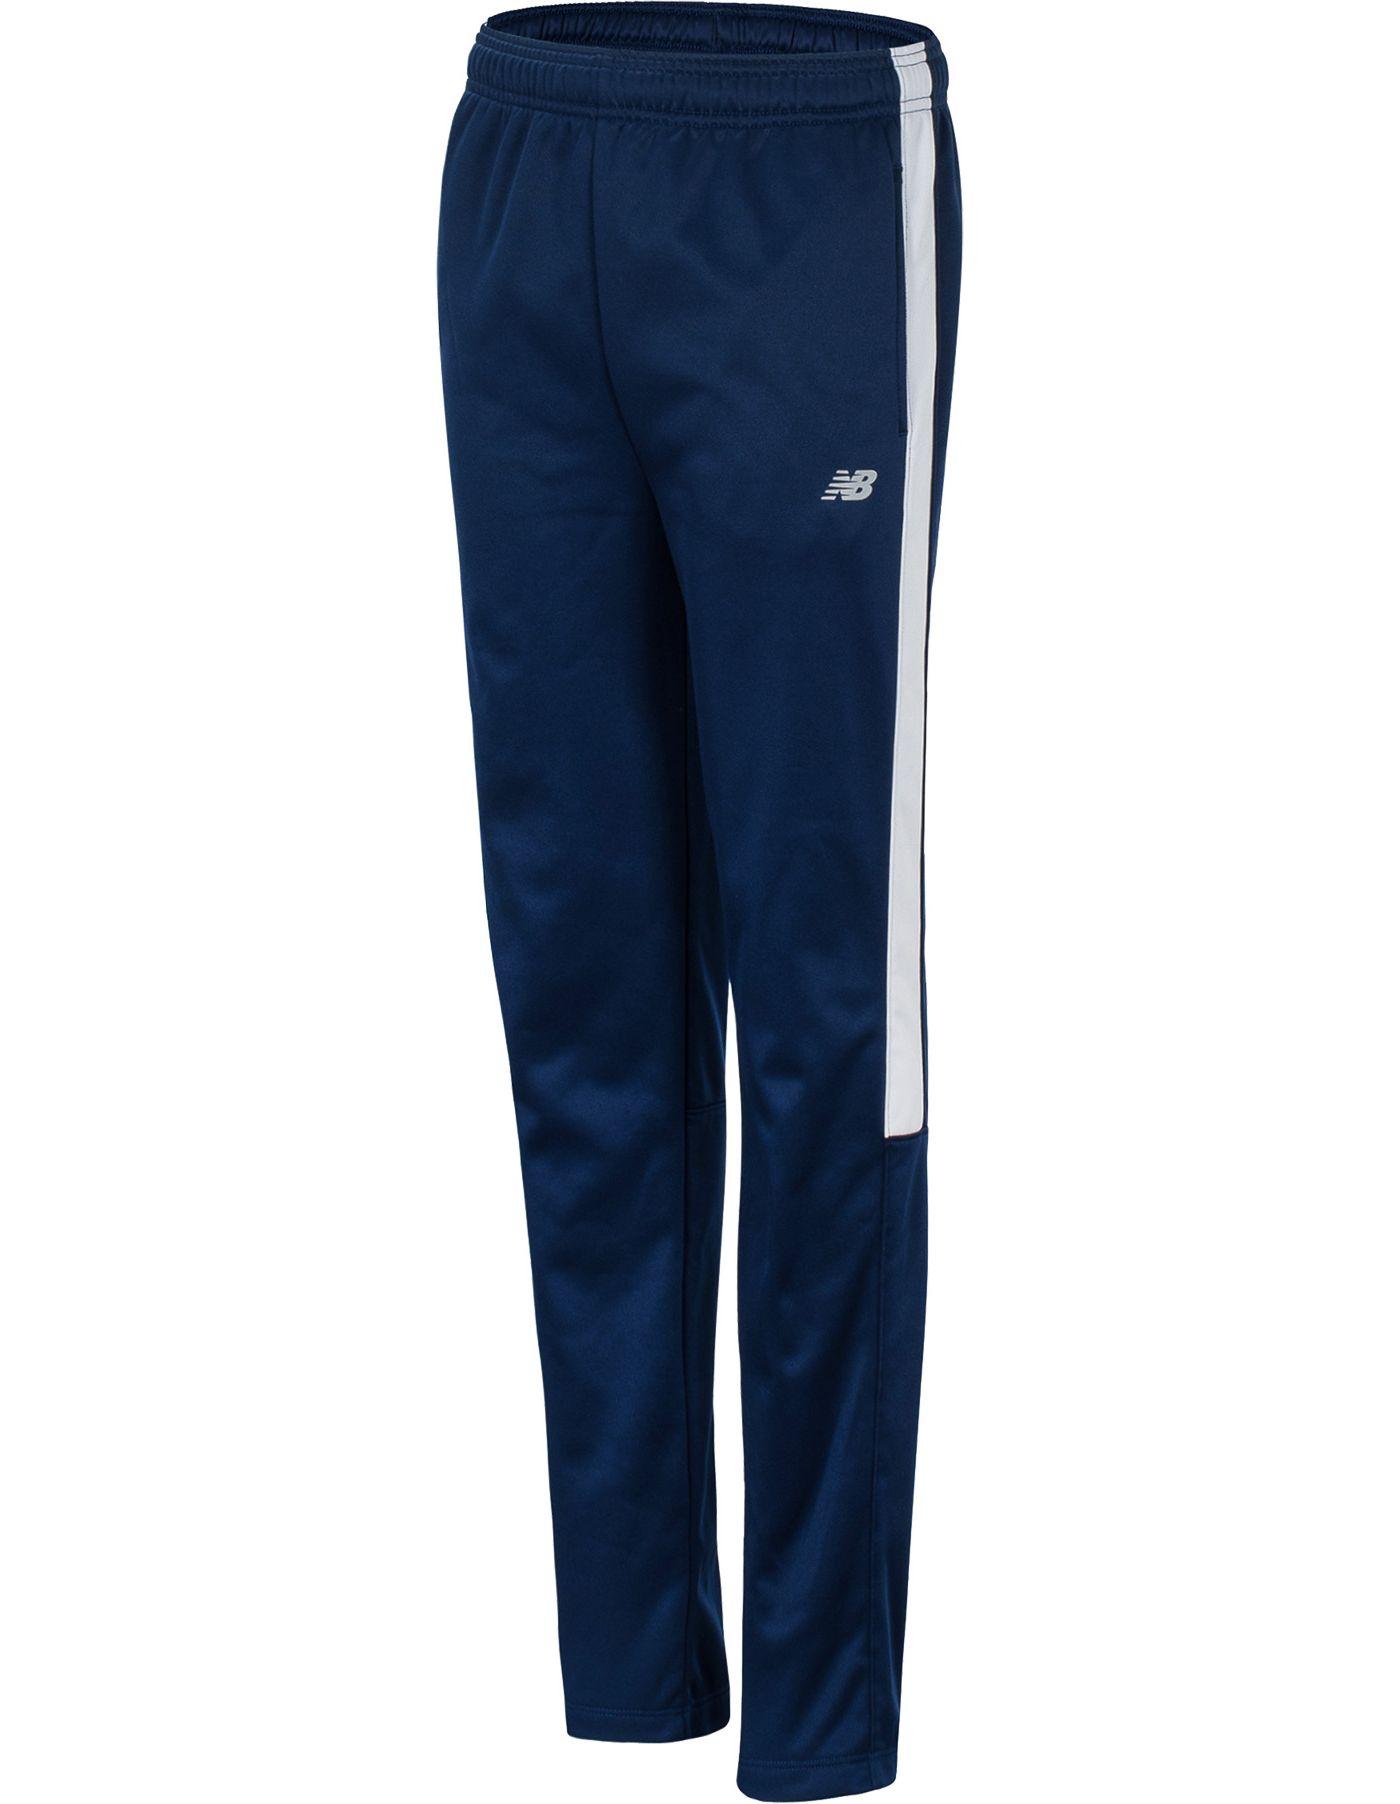 New Balance Little Boys' Athletic Pants